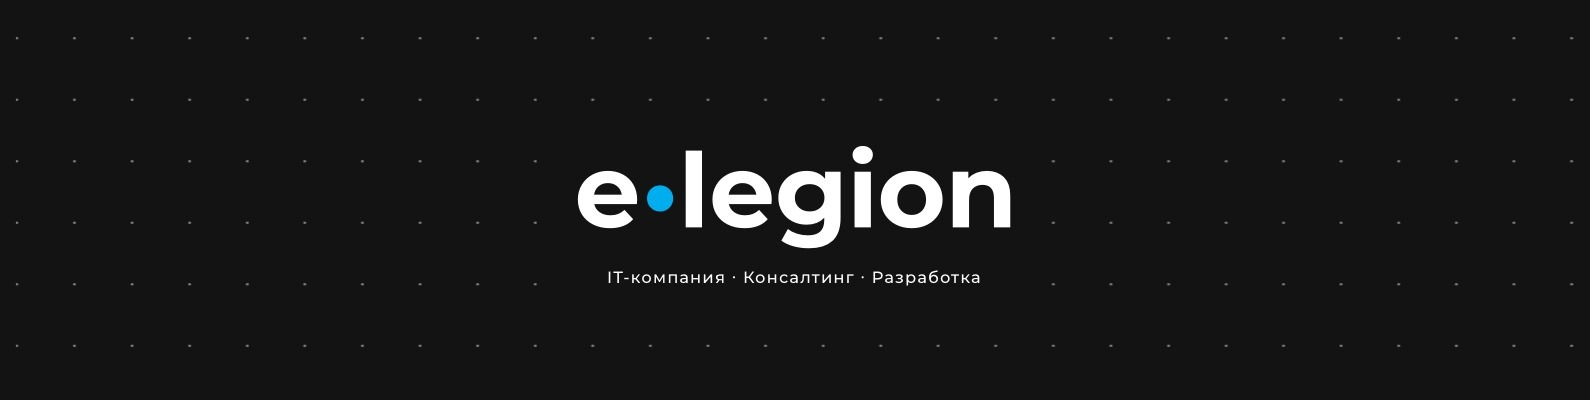 e-Legion: пять наград в четырех номинациях